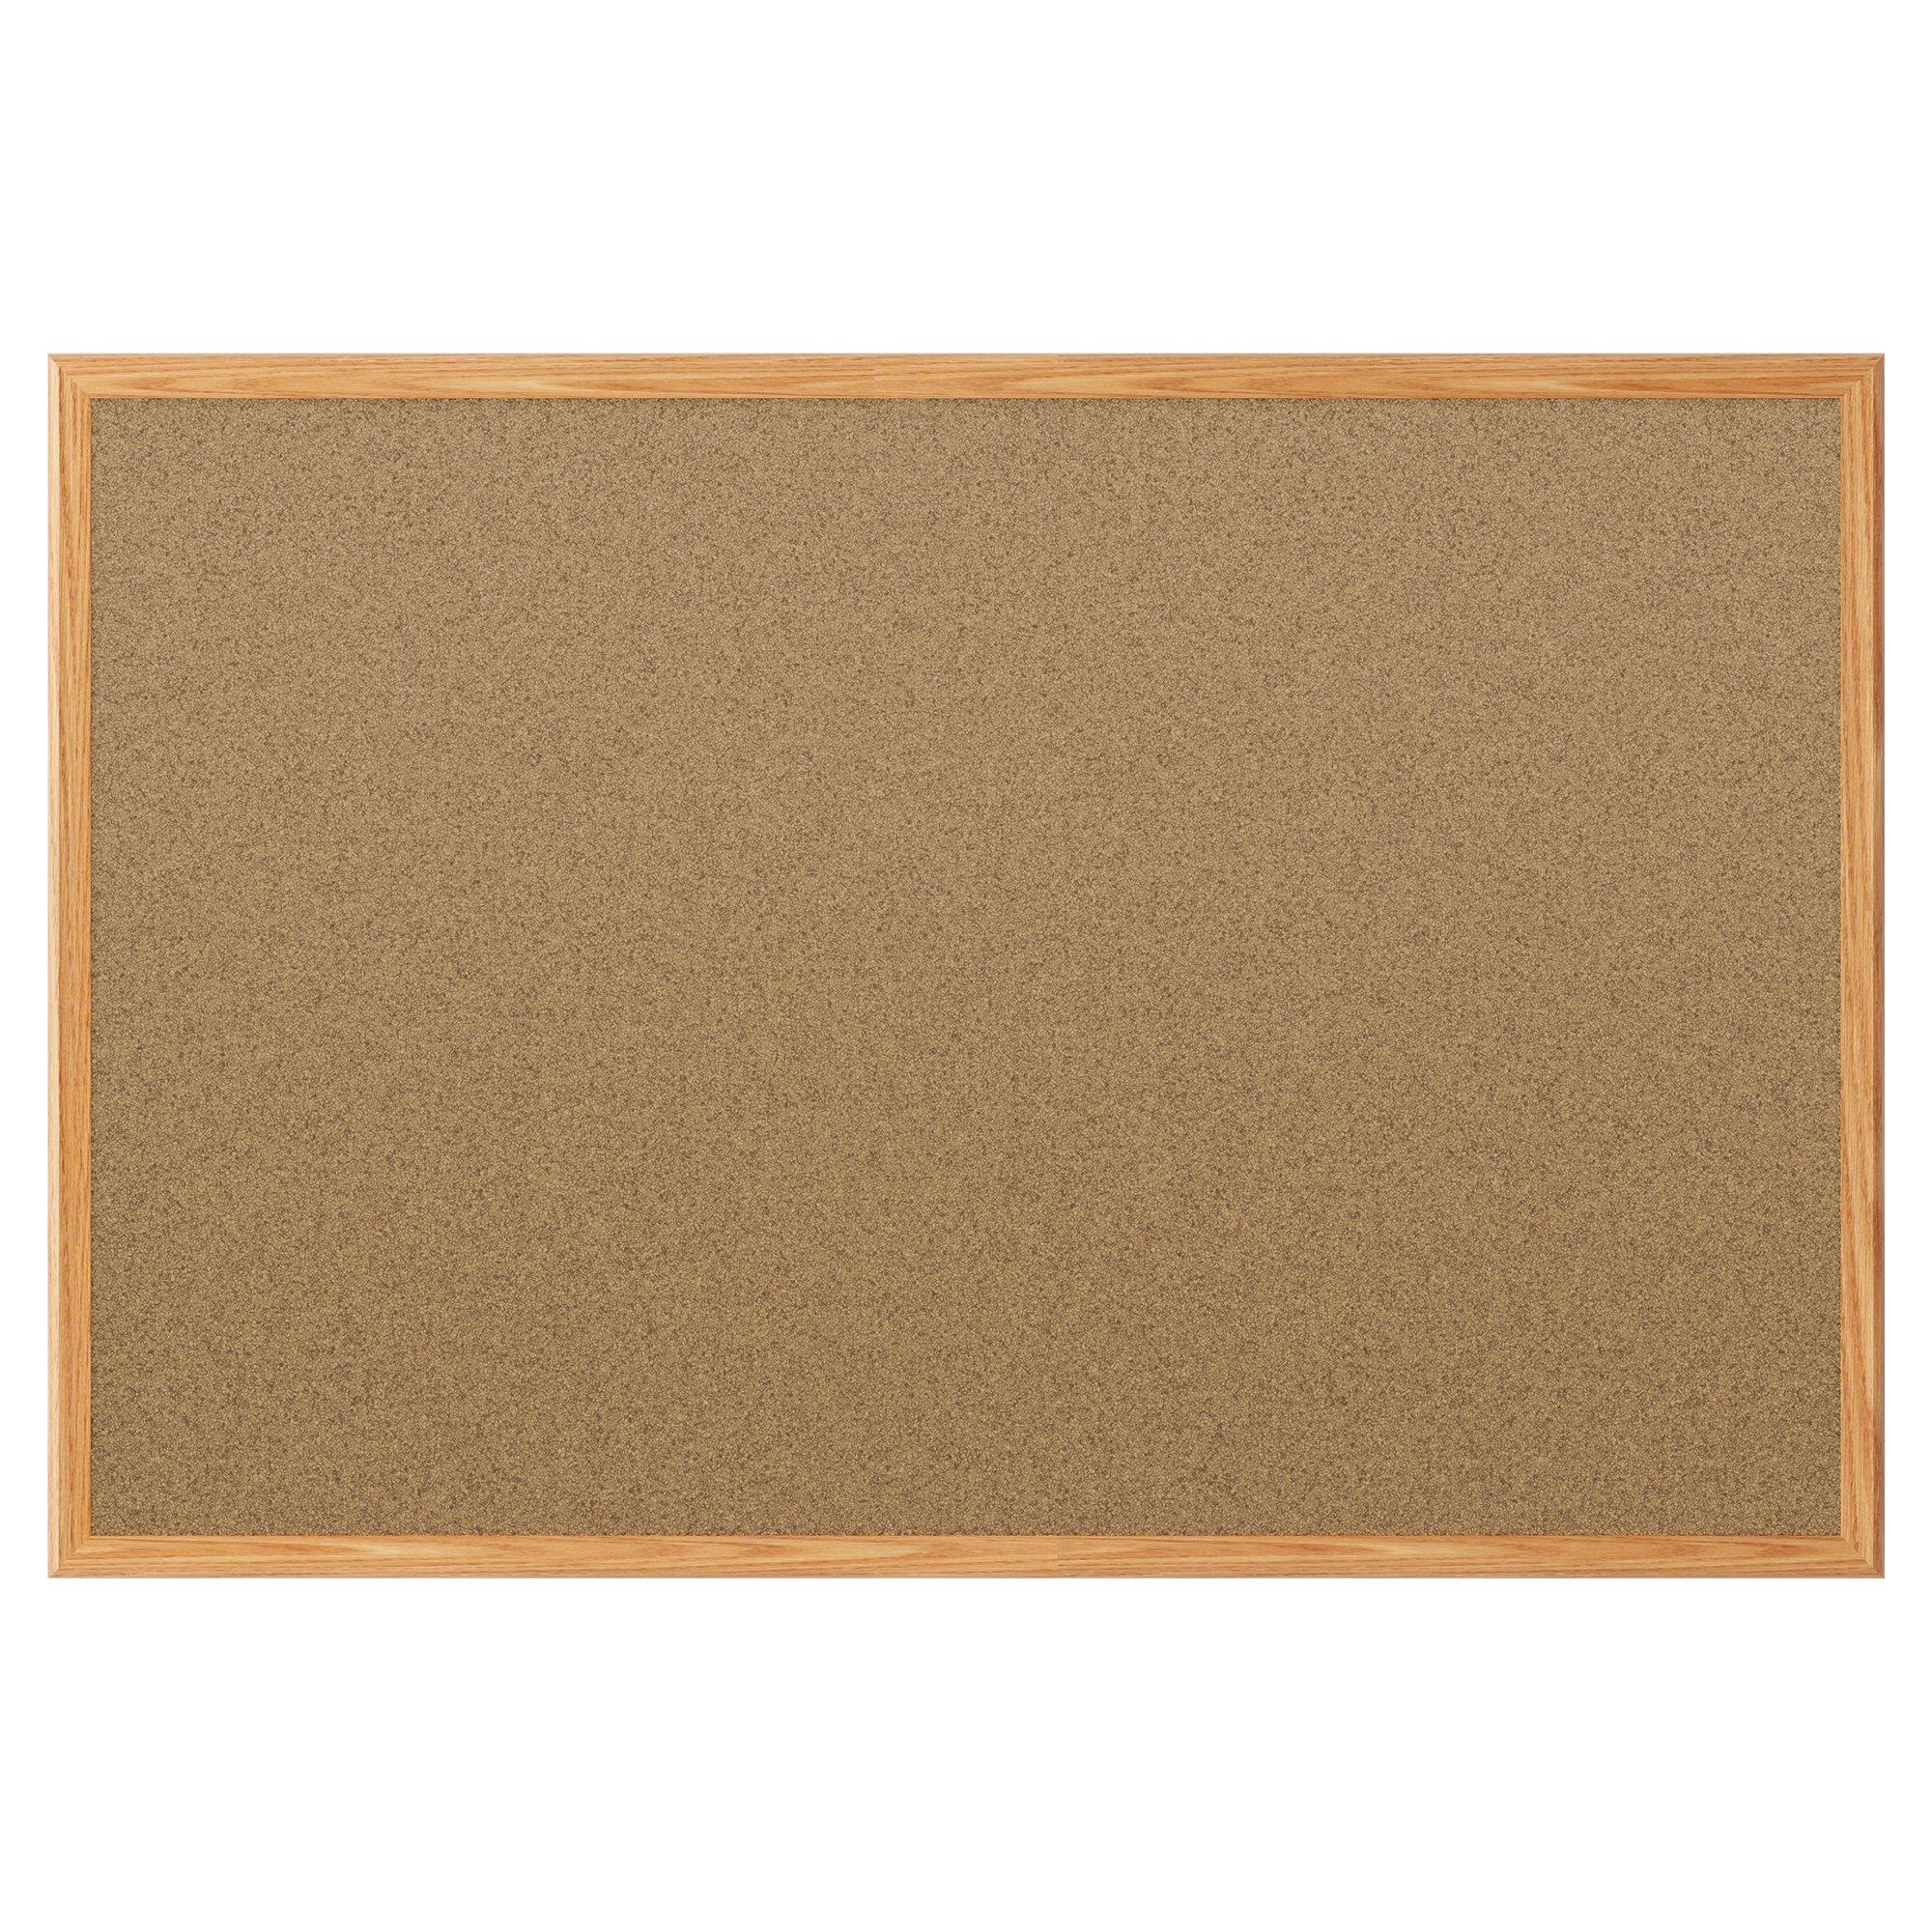 Mead Classic Cork Bulletin Board, Cork Board, 8' x 4',  Oak Finish Frame (85369)